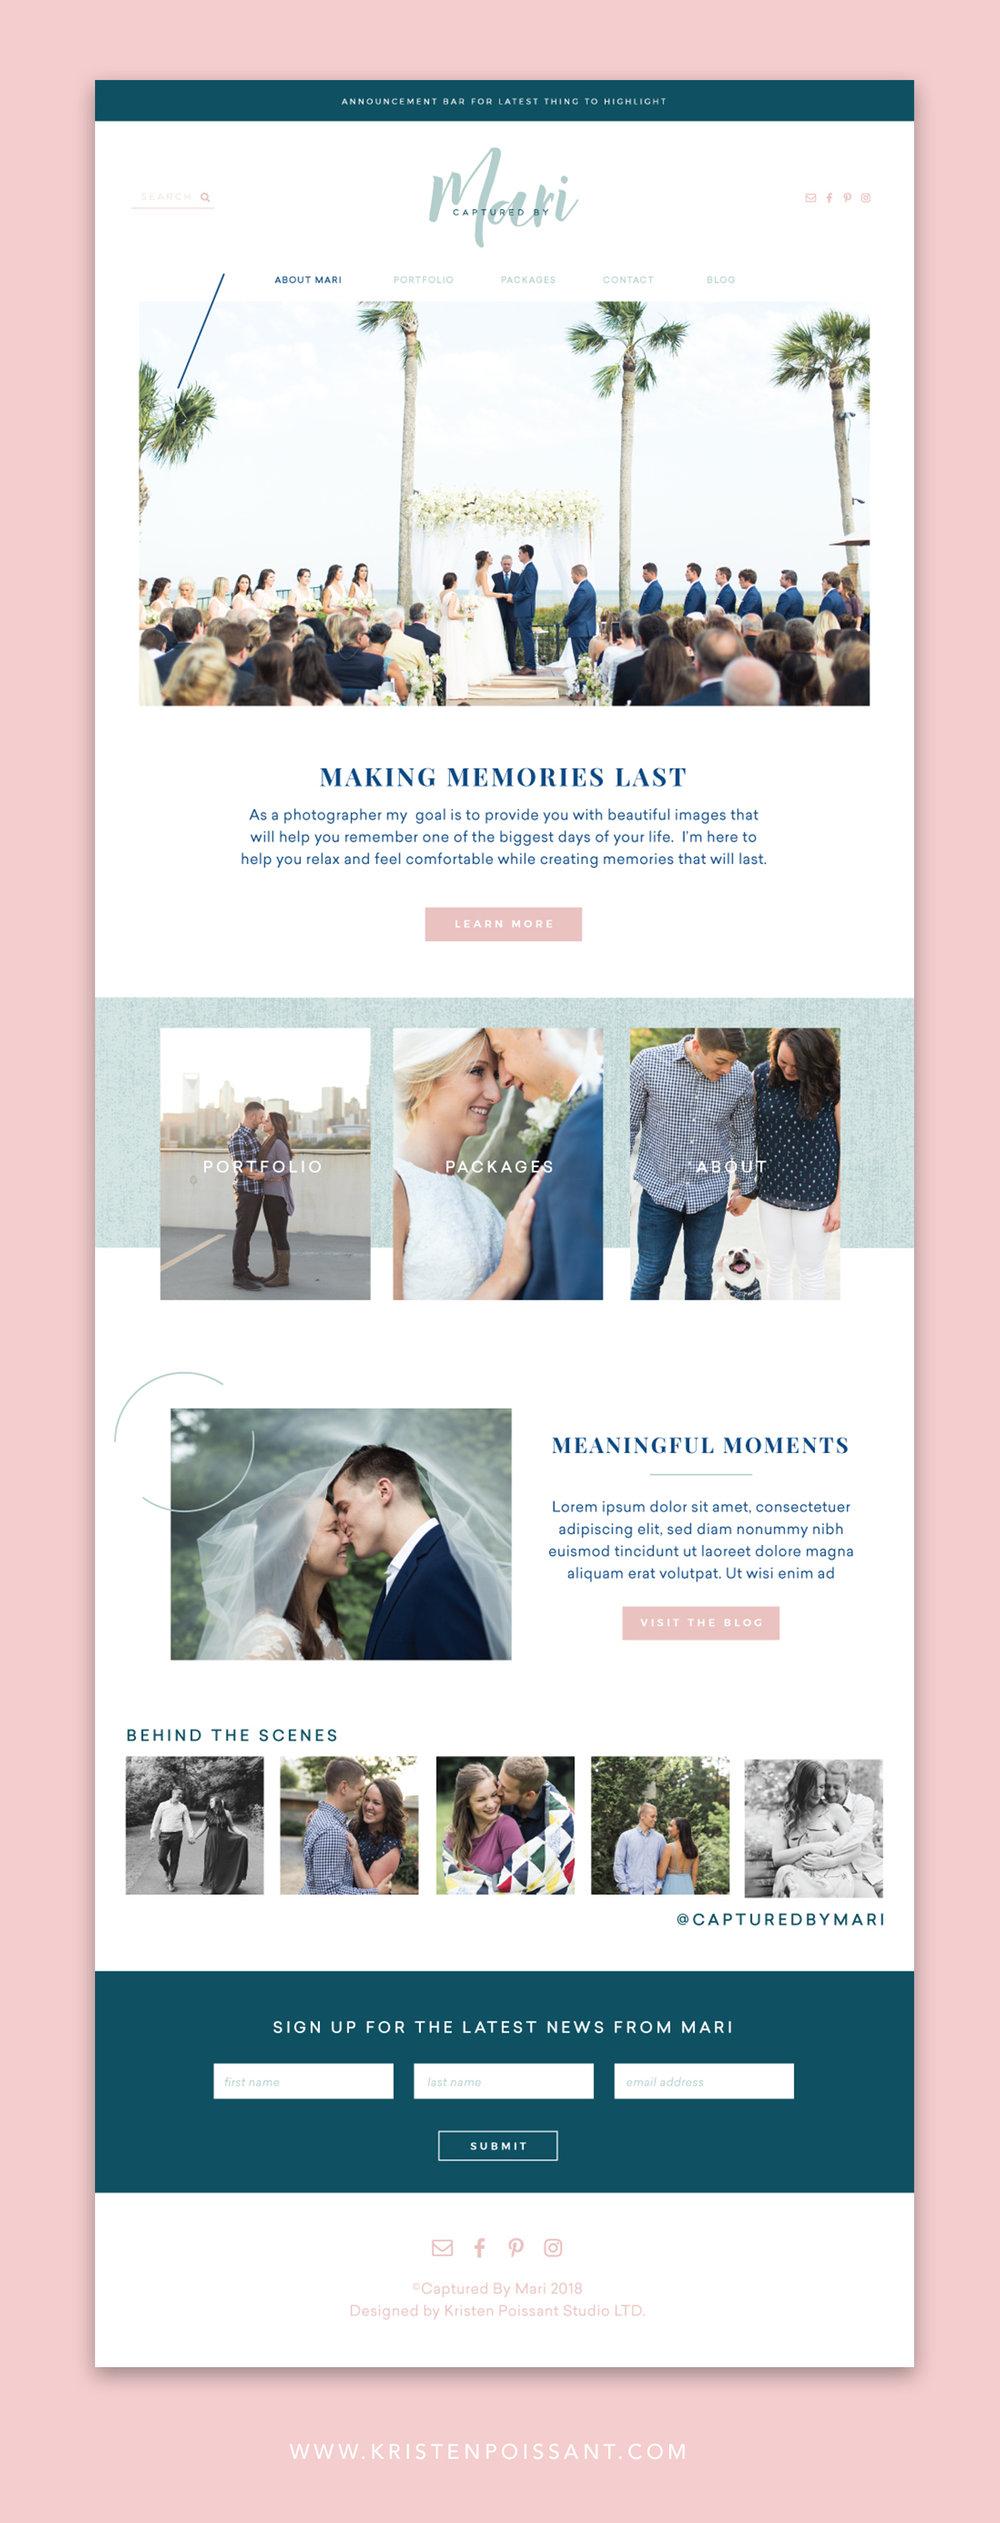 Wedding-photographer-website-design-by-kristen-poissant.jpg